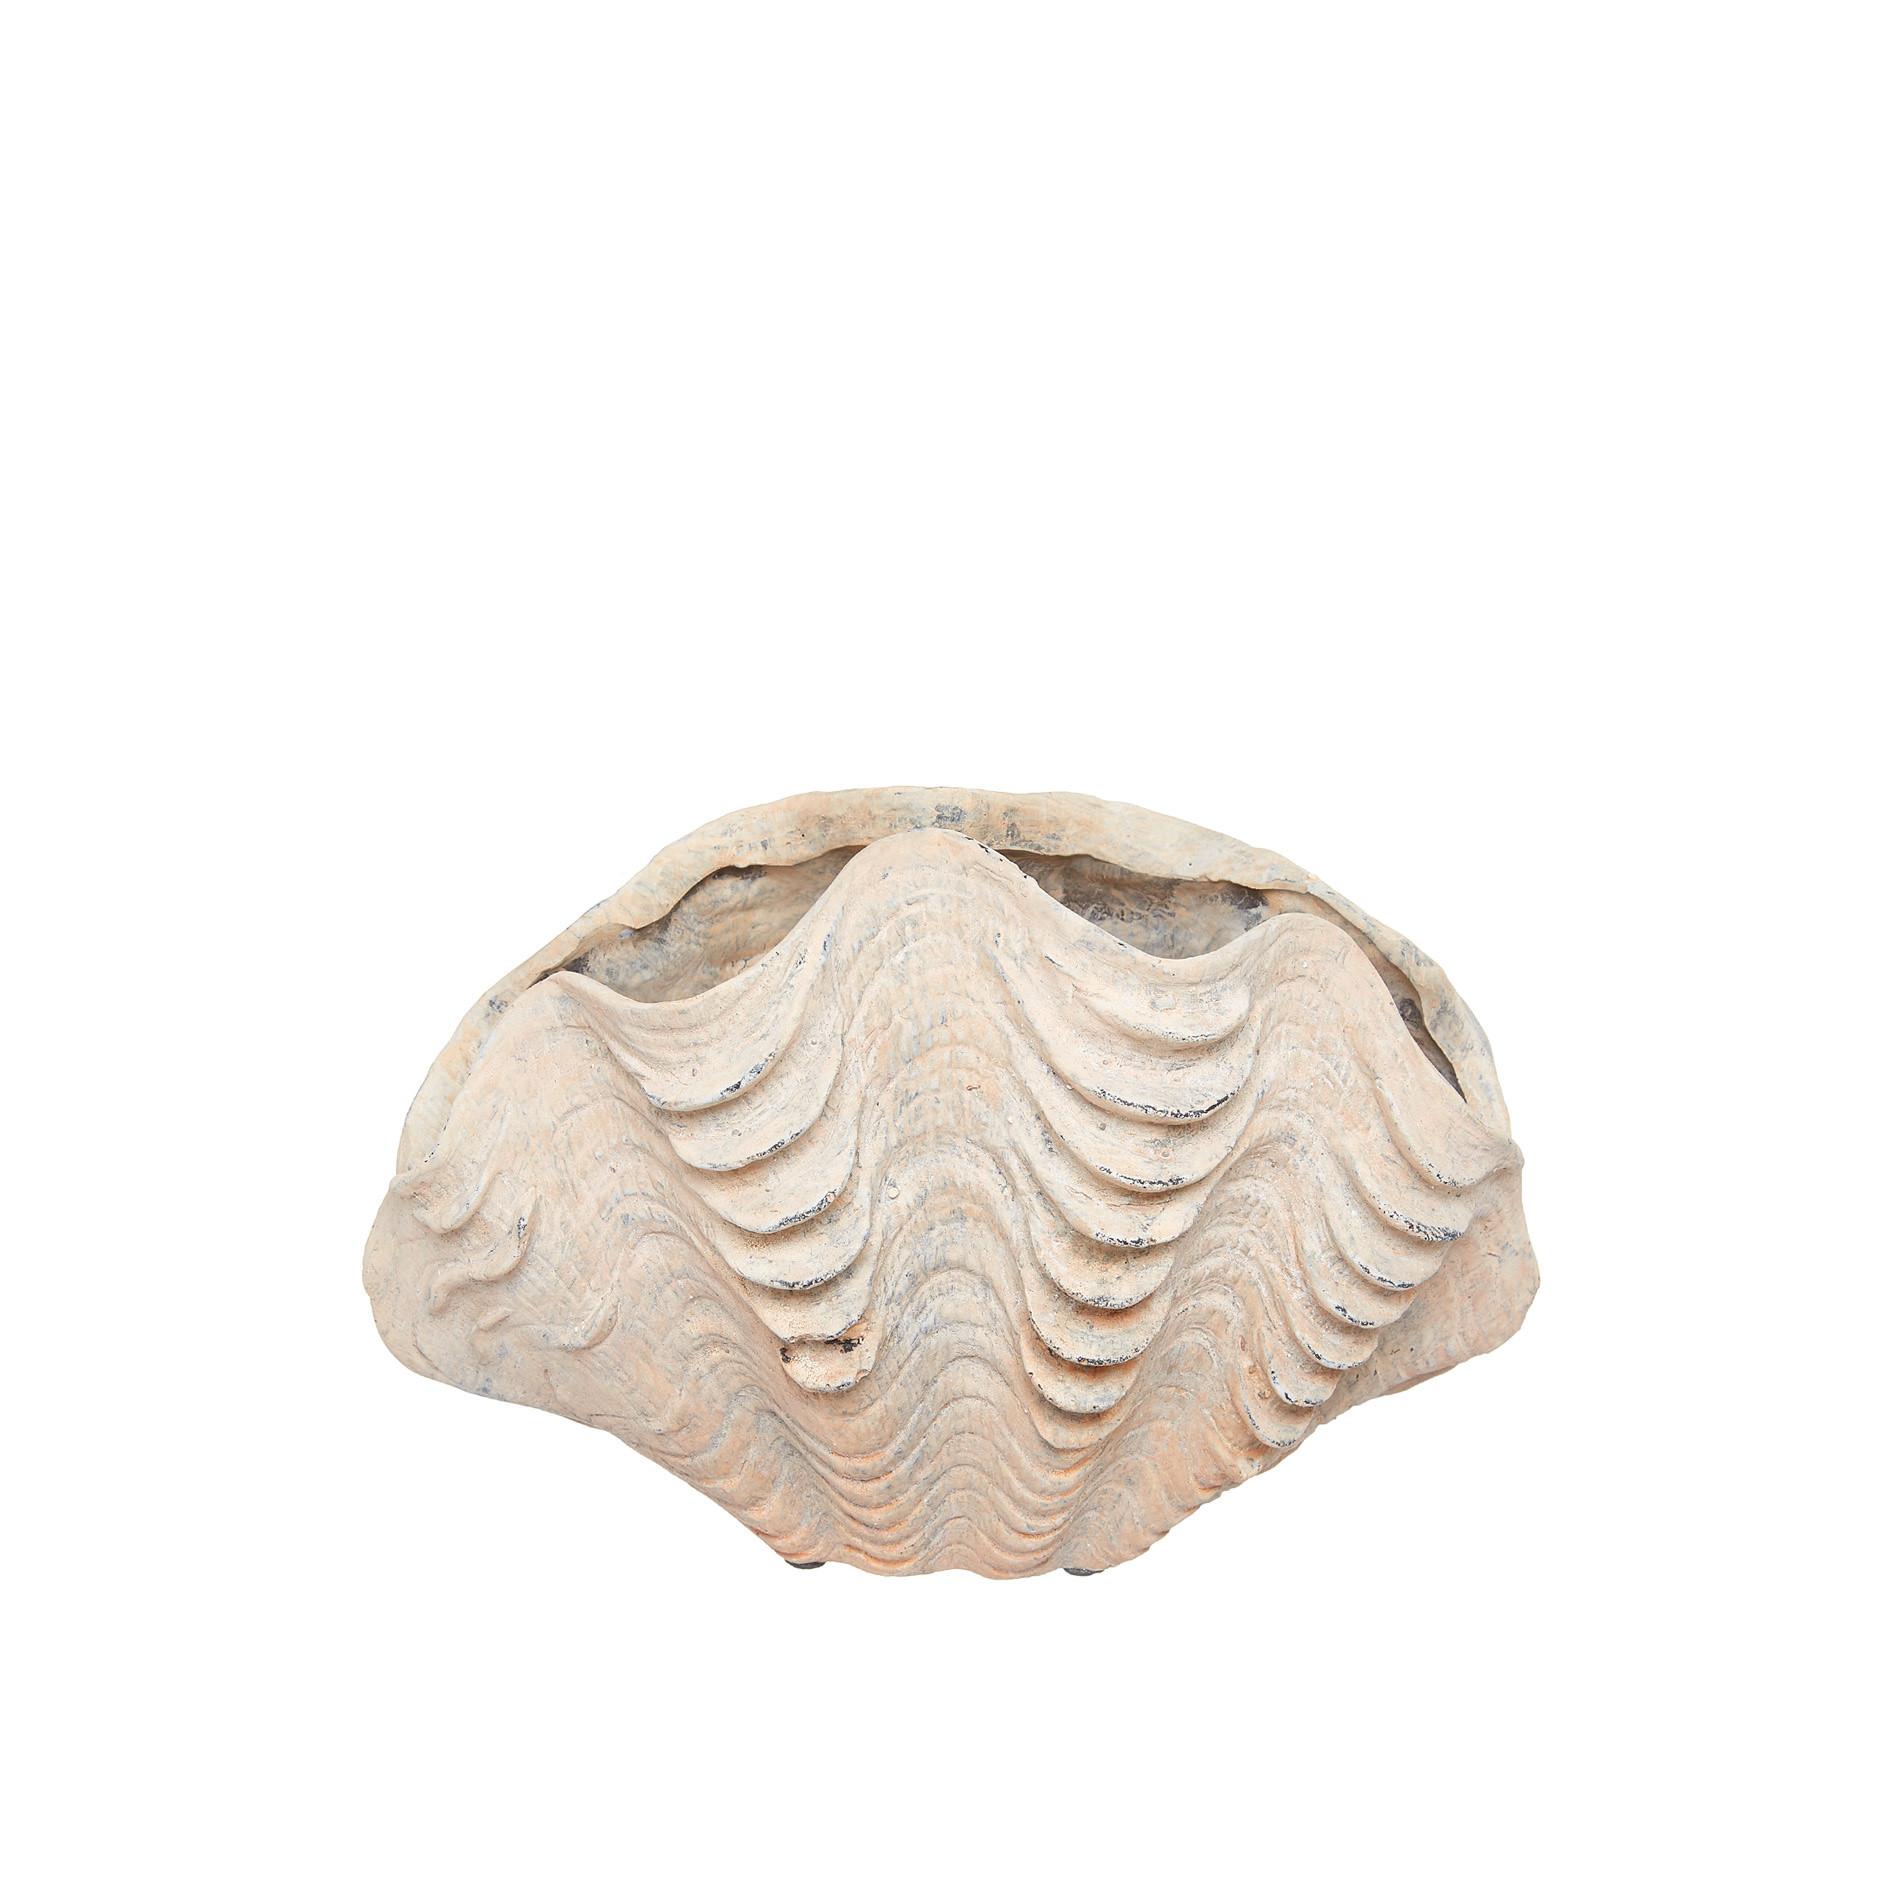 Pot a conchiglia rifinita a mano, Bianco, large image number 0